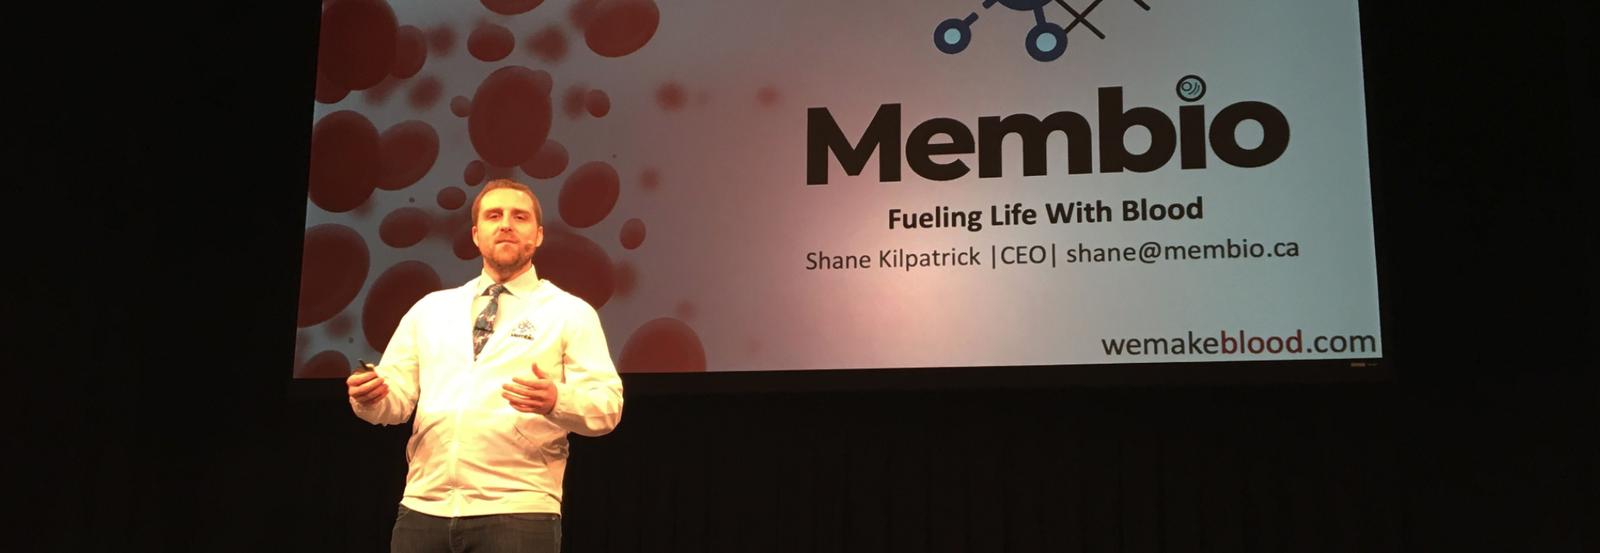 Shane Kilpatrick presenting Membio